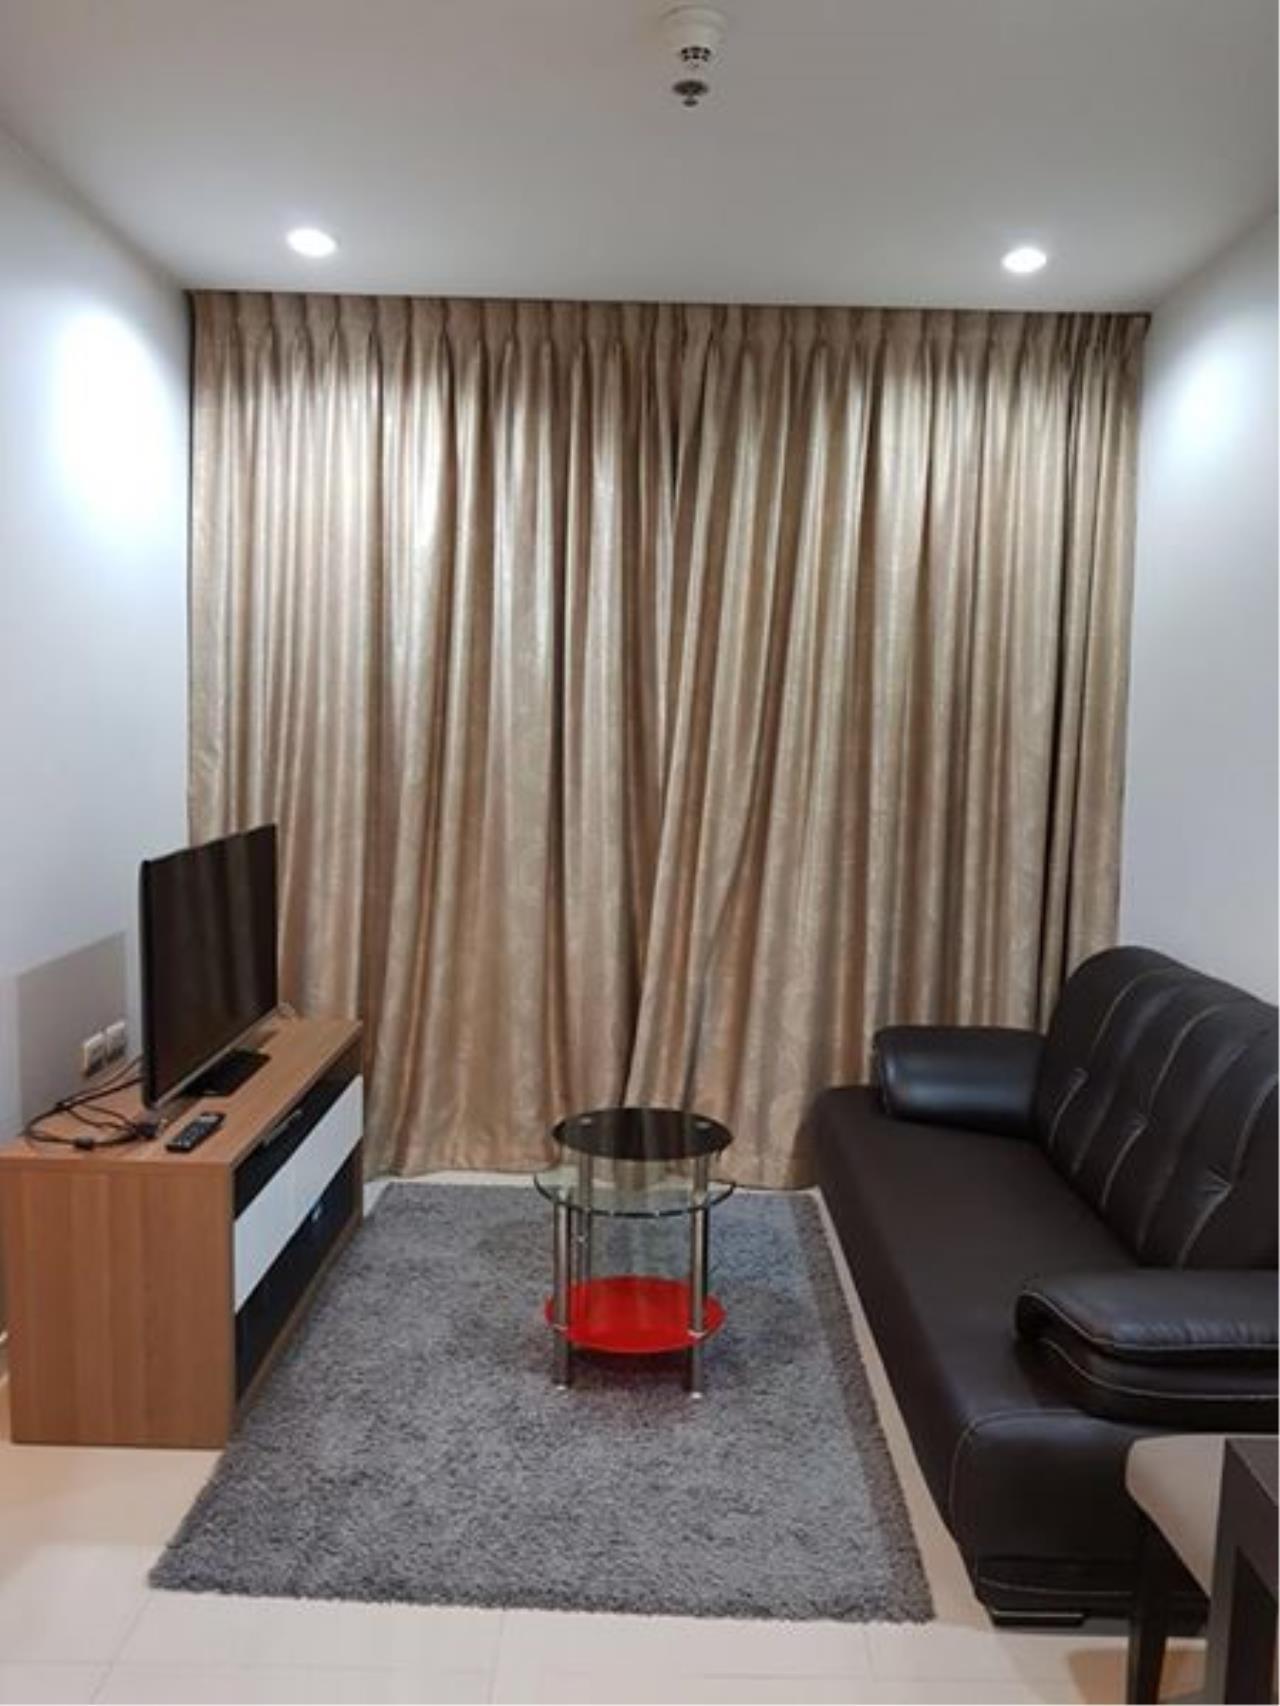 Century21 Skylux Agency's Circle Condominium / Condo For Sale / 1 Bedroom / 39.76 SQM / MRT Phetchaburi / Bangkok 2